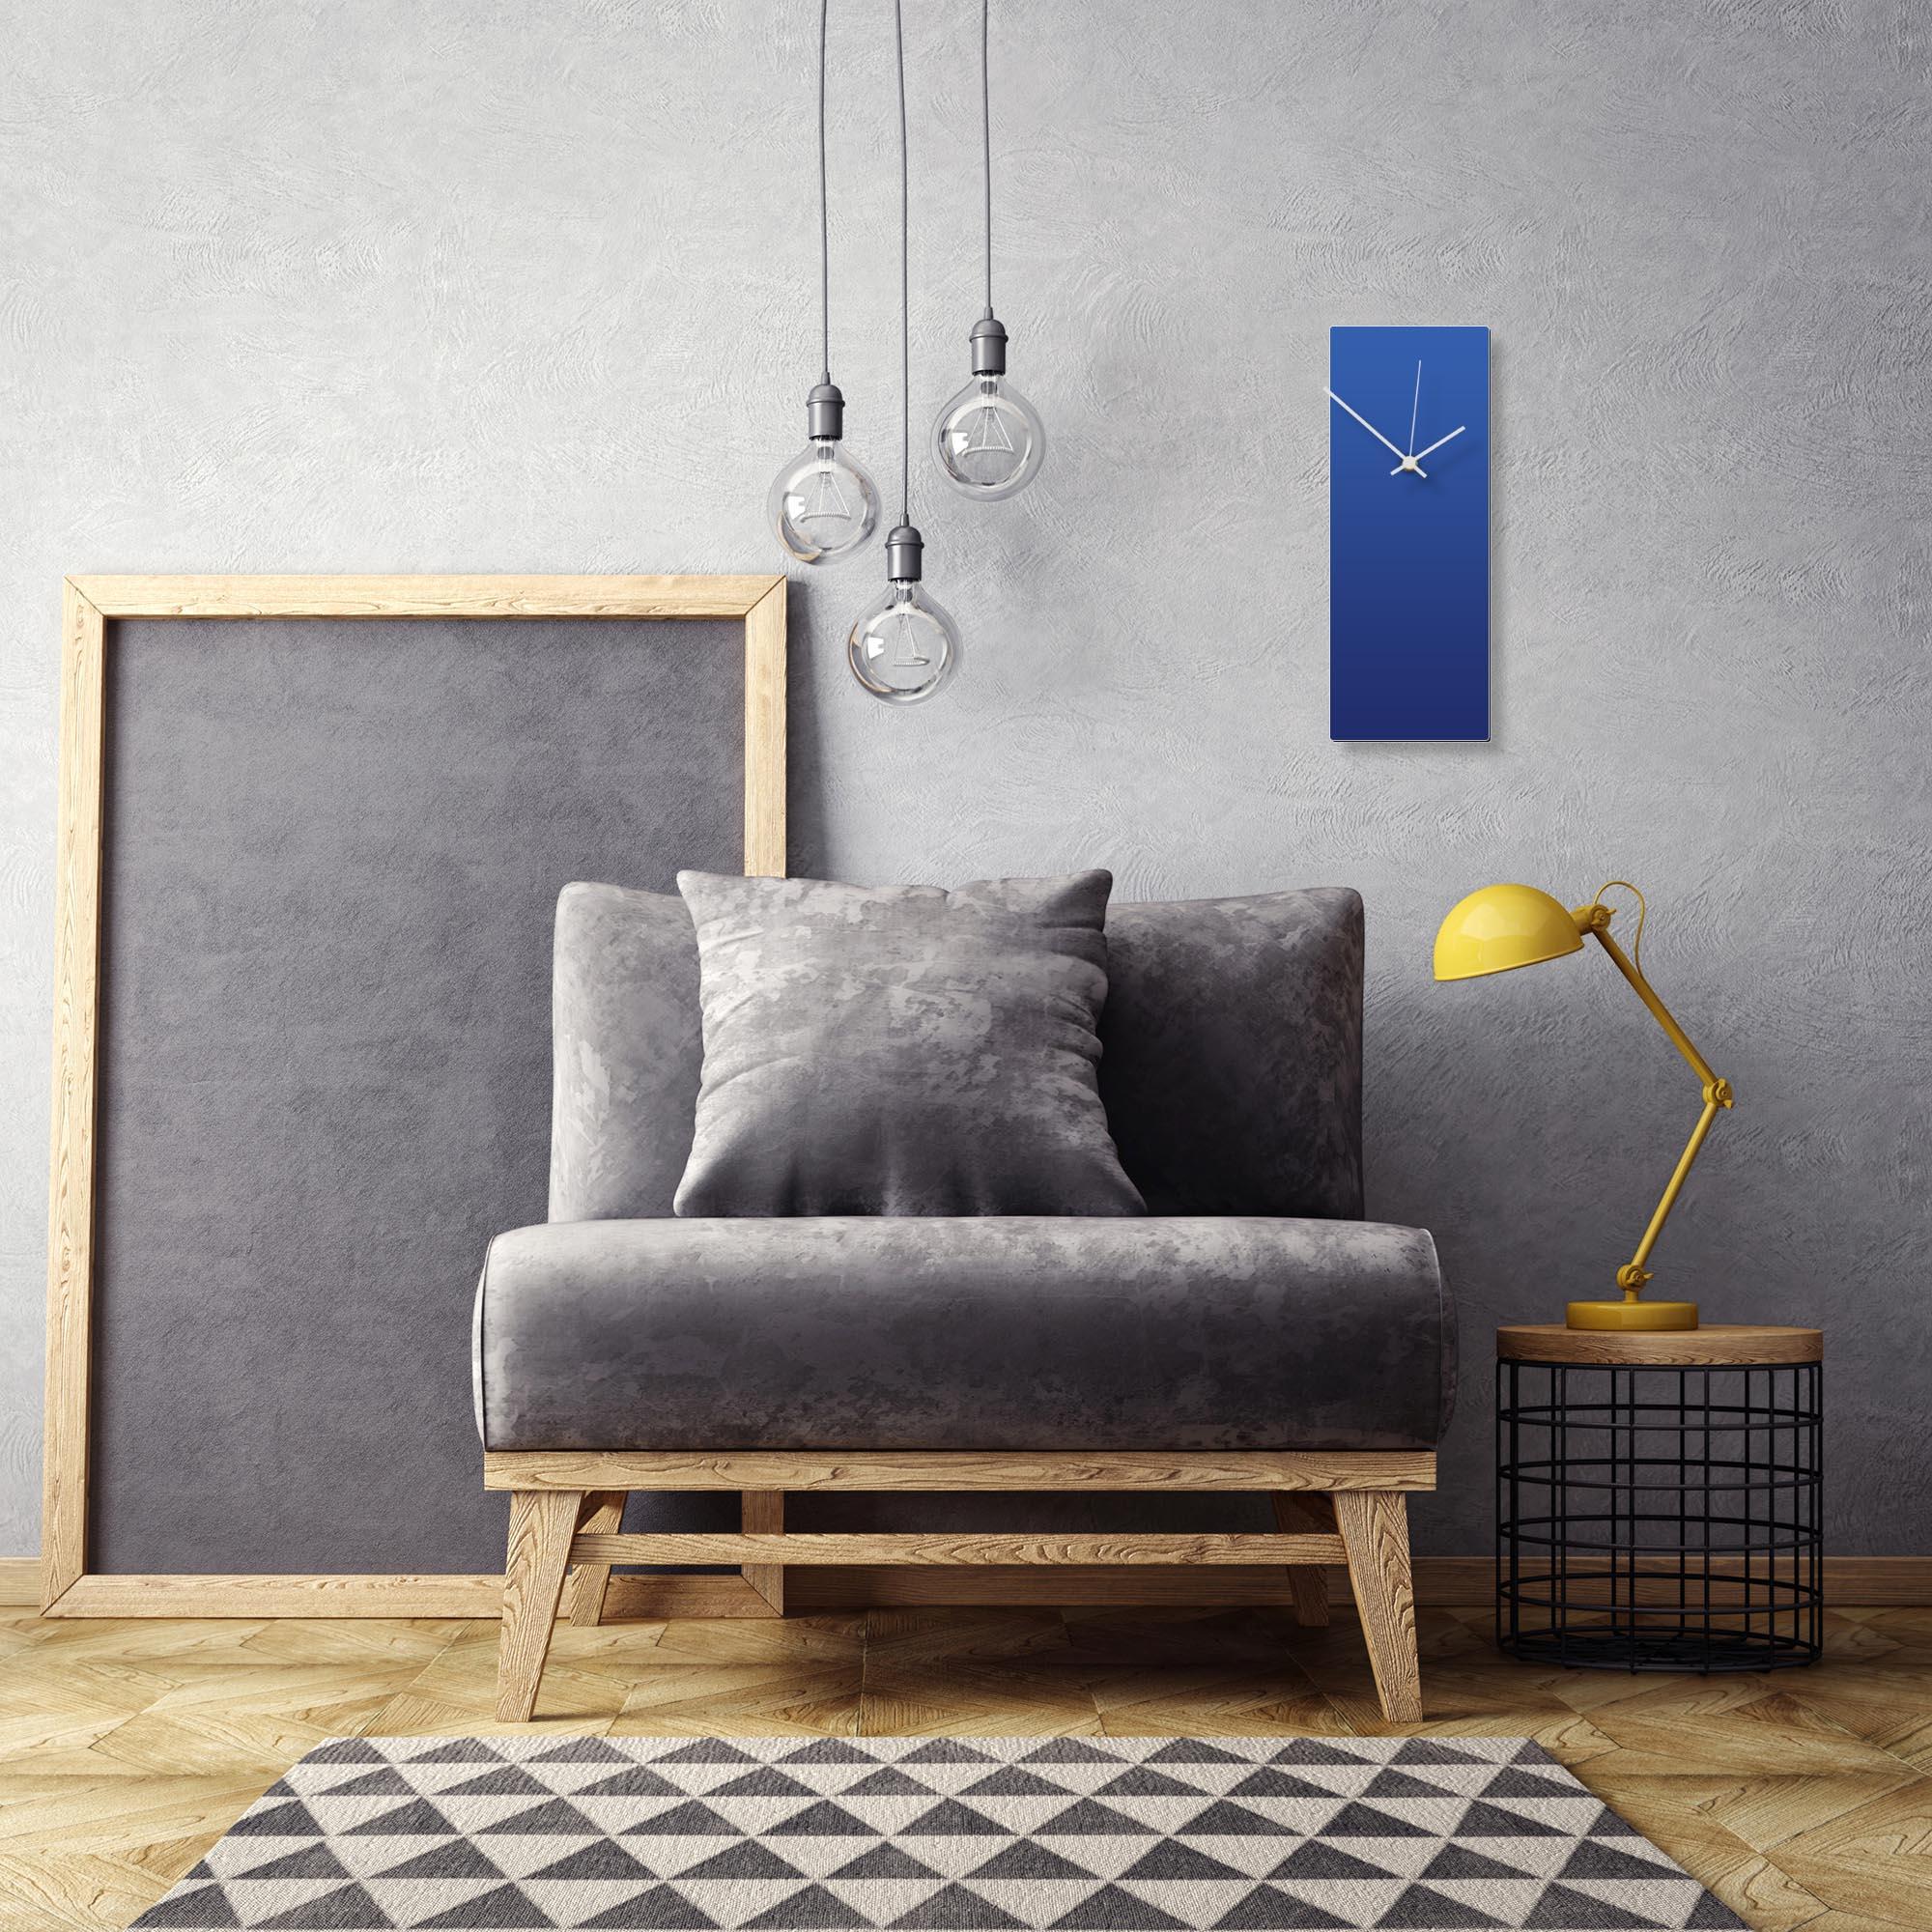 Blueout White Clock by Adam Schwoeppe Contemporary Clock on Aluminum Polymetal - Alternate View 1